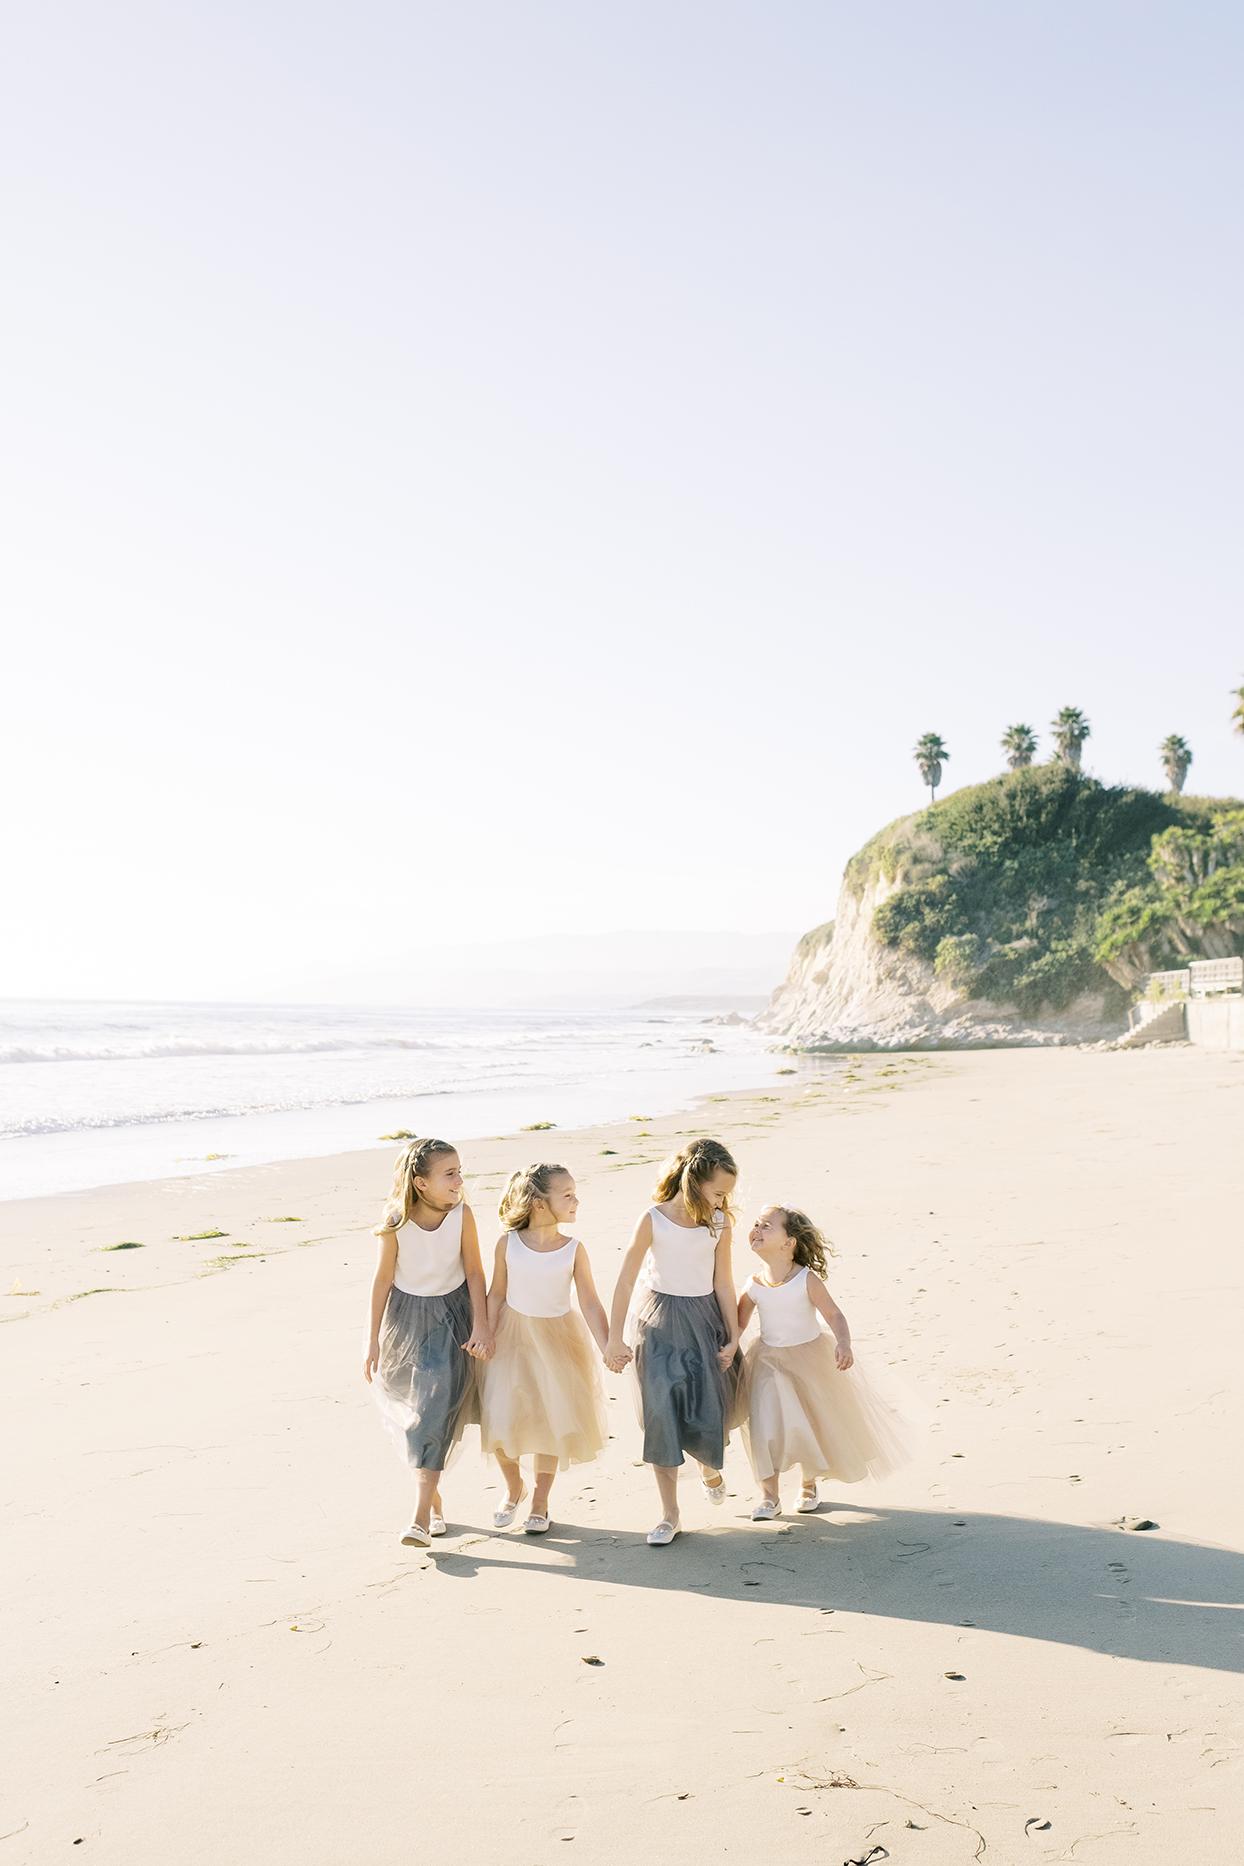 flower girls walking hand in hand on beach